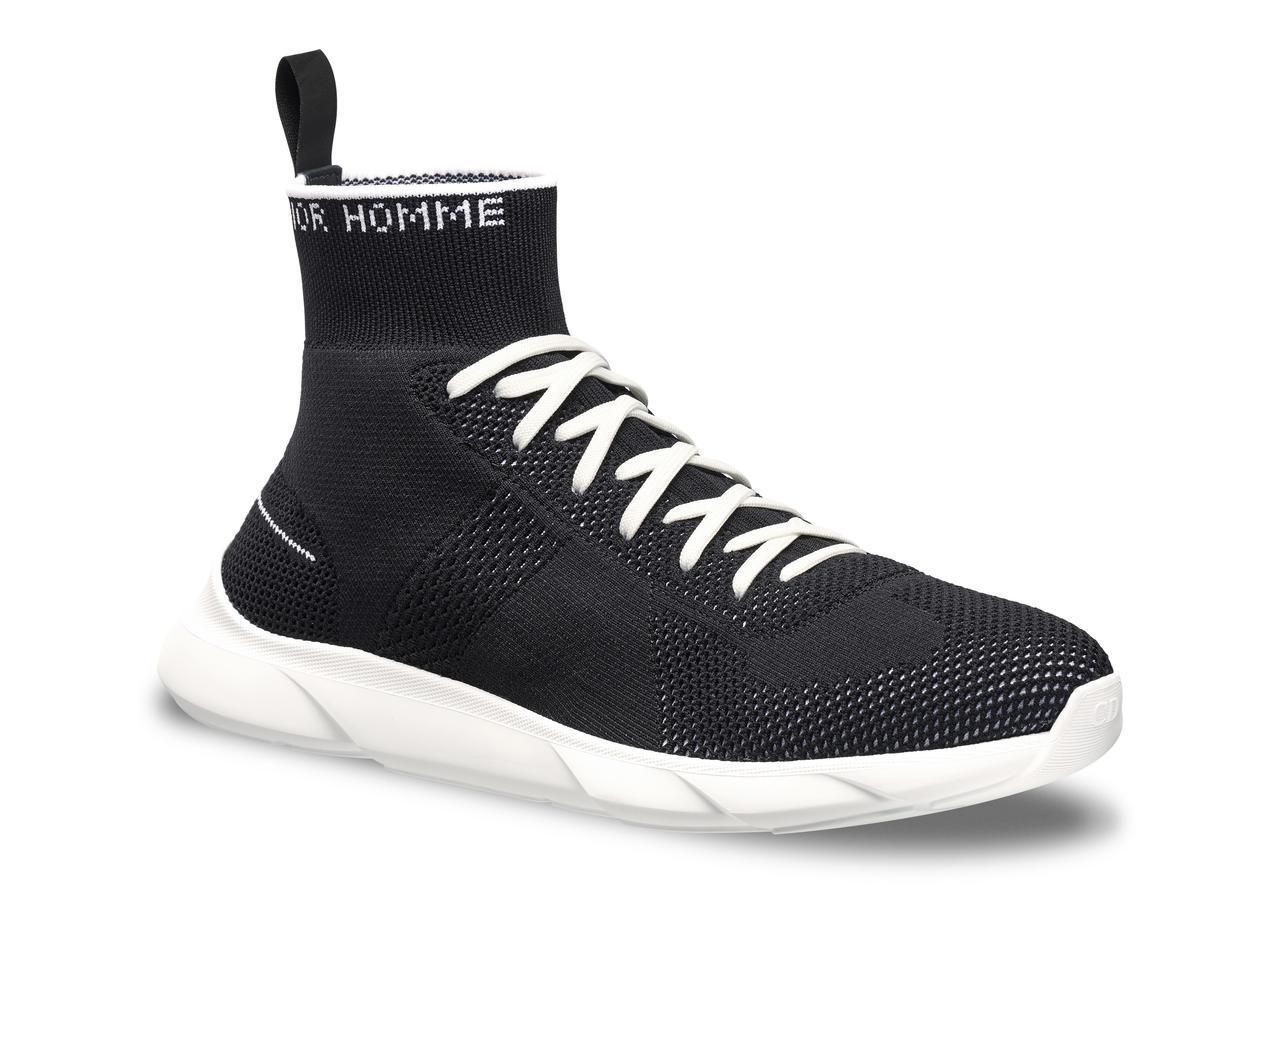 B21黑色網眼飾襪運動鞋,售價22,000元。圖/Dior提供